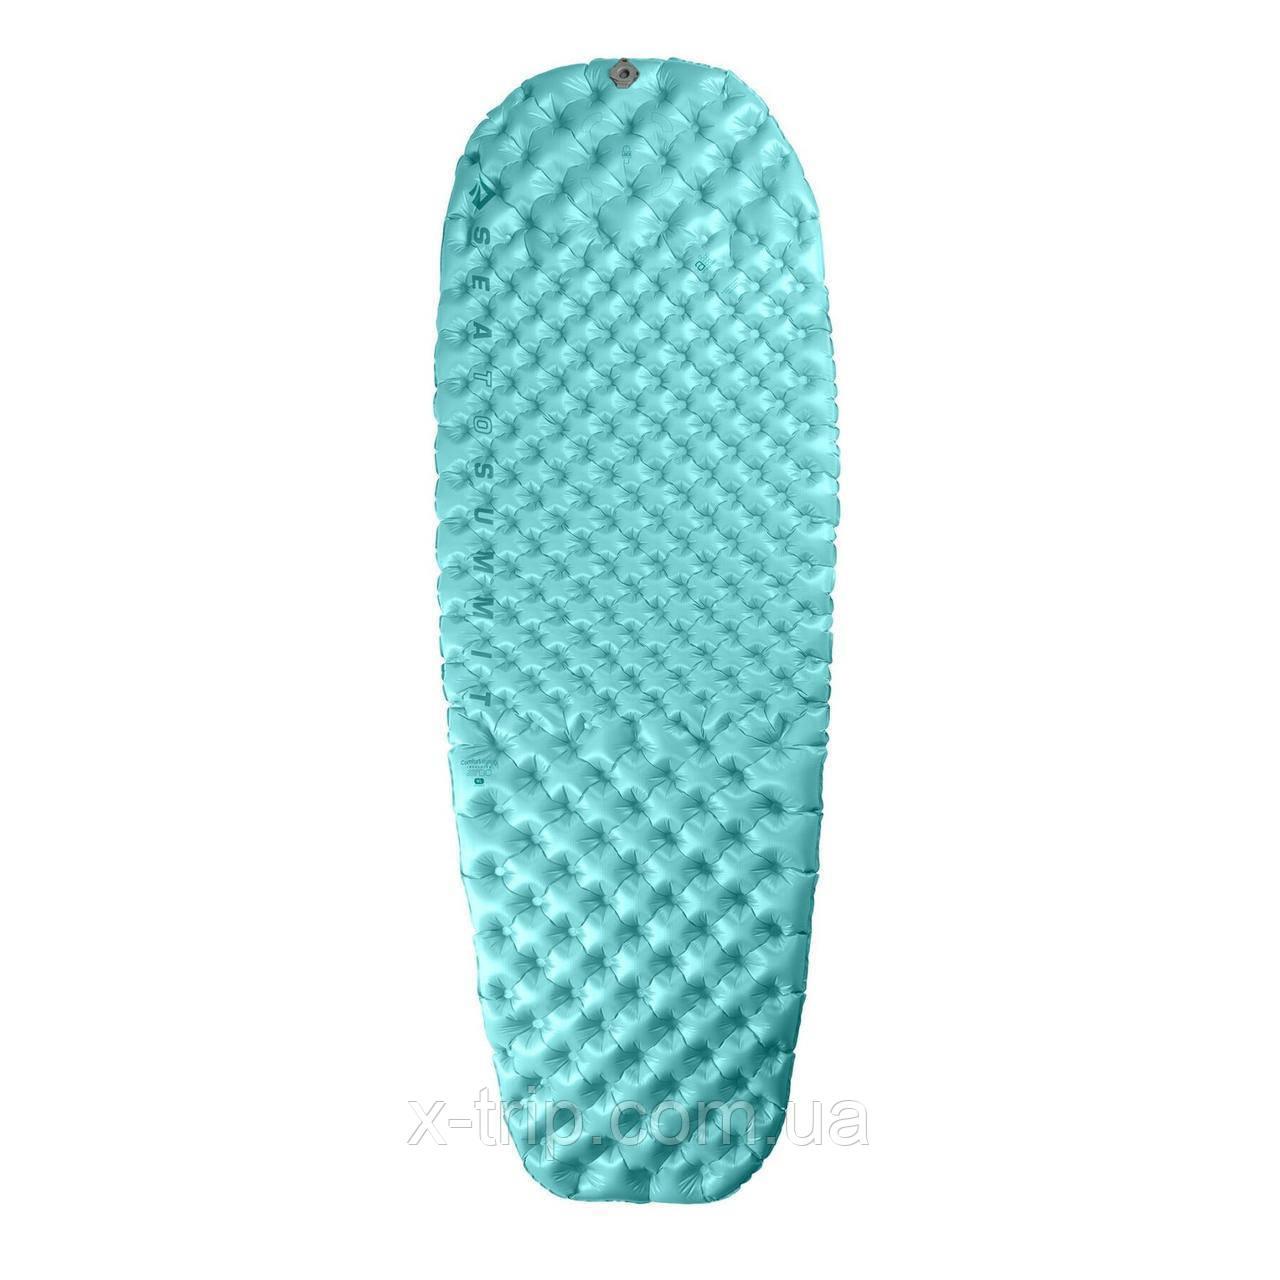 Надувной коврик Sea To Summit Women's Comfort Light Insulated Mat Regular (STS AMCLINSWRAS)